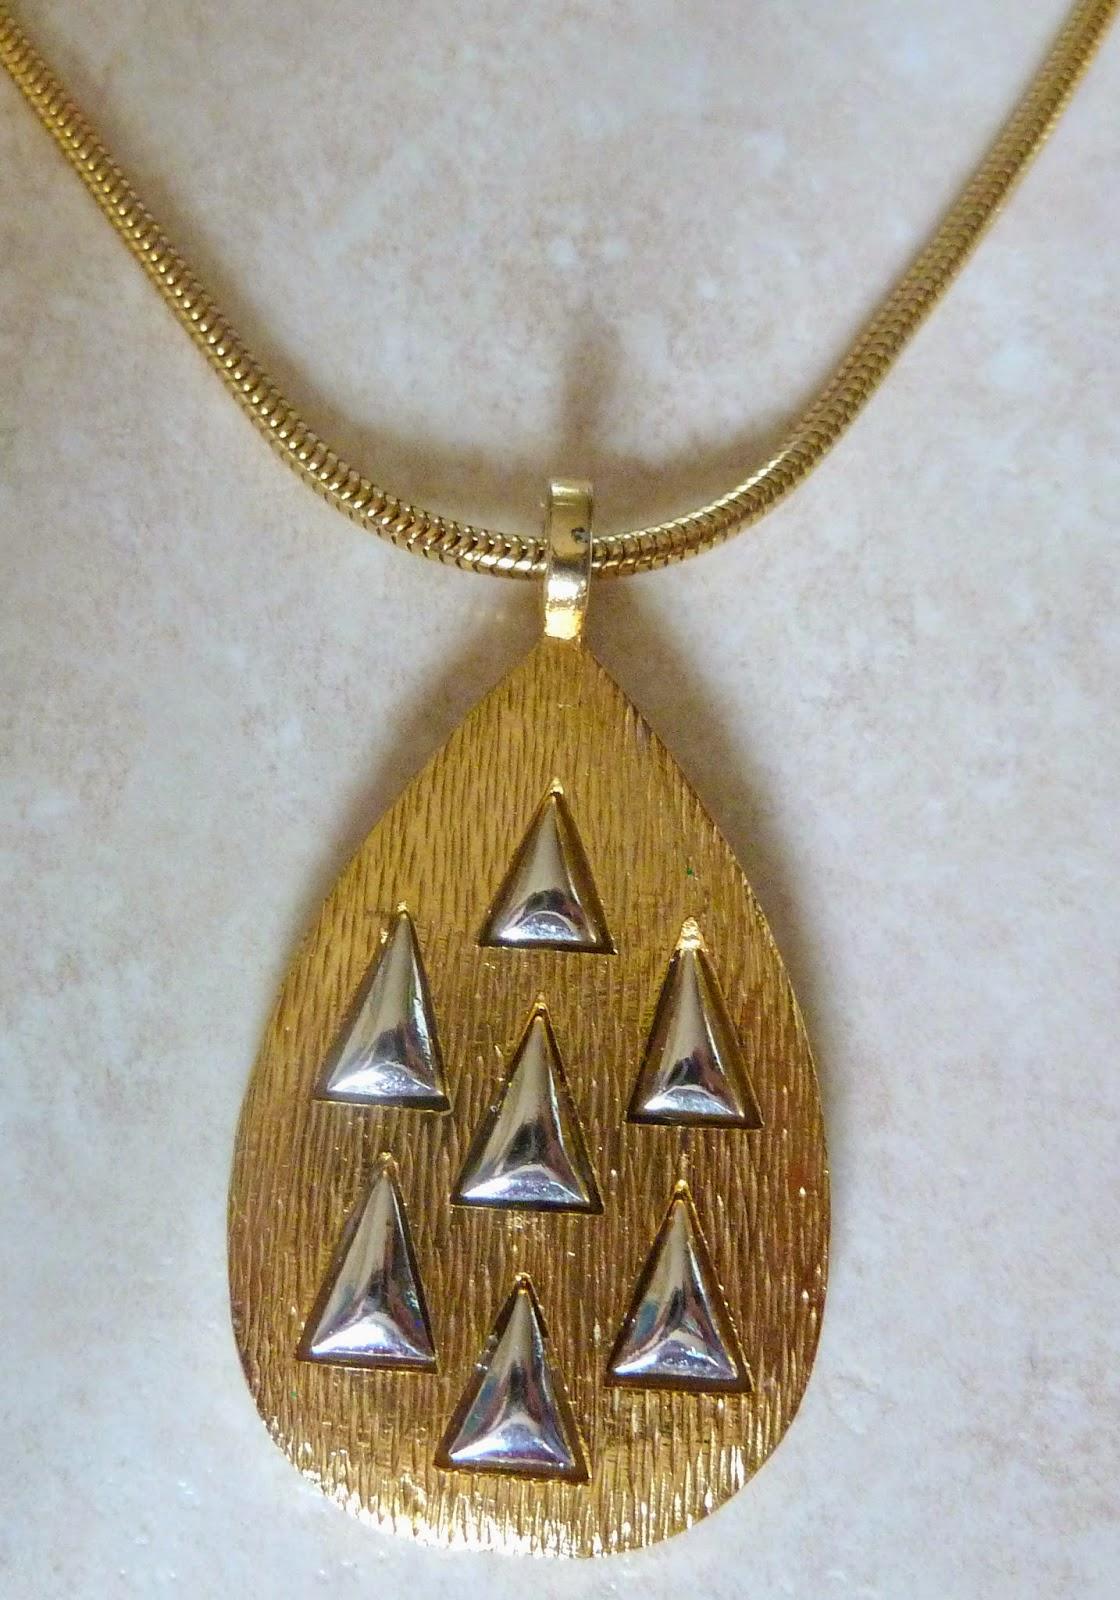 http://www.kcavintagegems.uk/vintage-modernist-style-teardrop-pendant-and-necklace-by-sphinx-341-p.asp